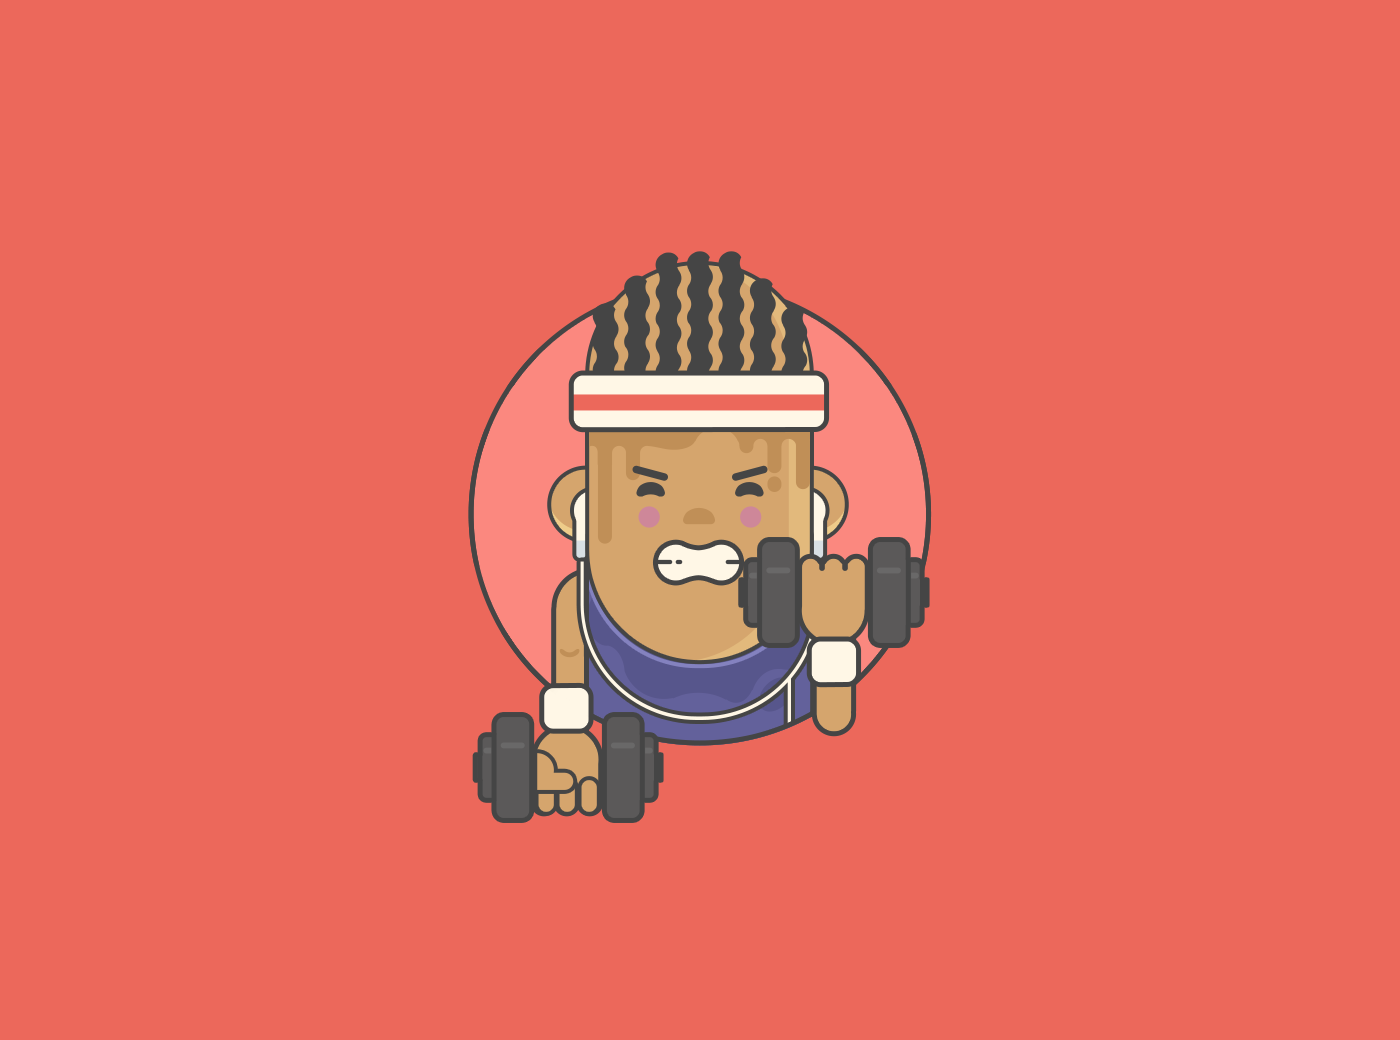 flat design outlines print icons avatar characters Sandiego seattle geek photoshop flatdesign vector